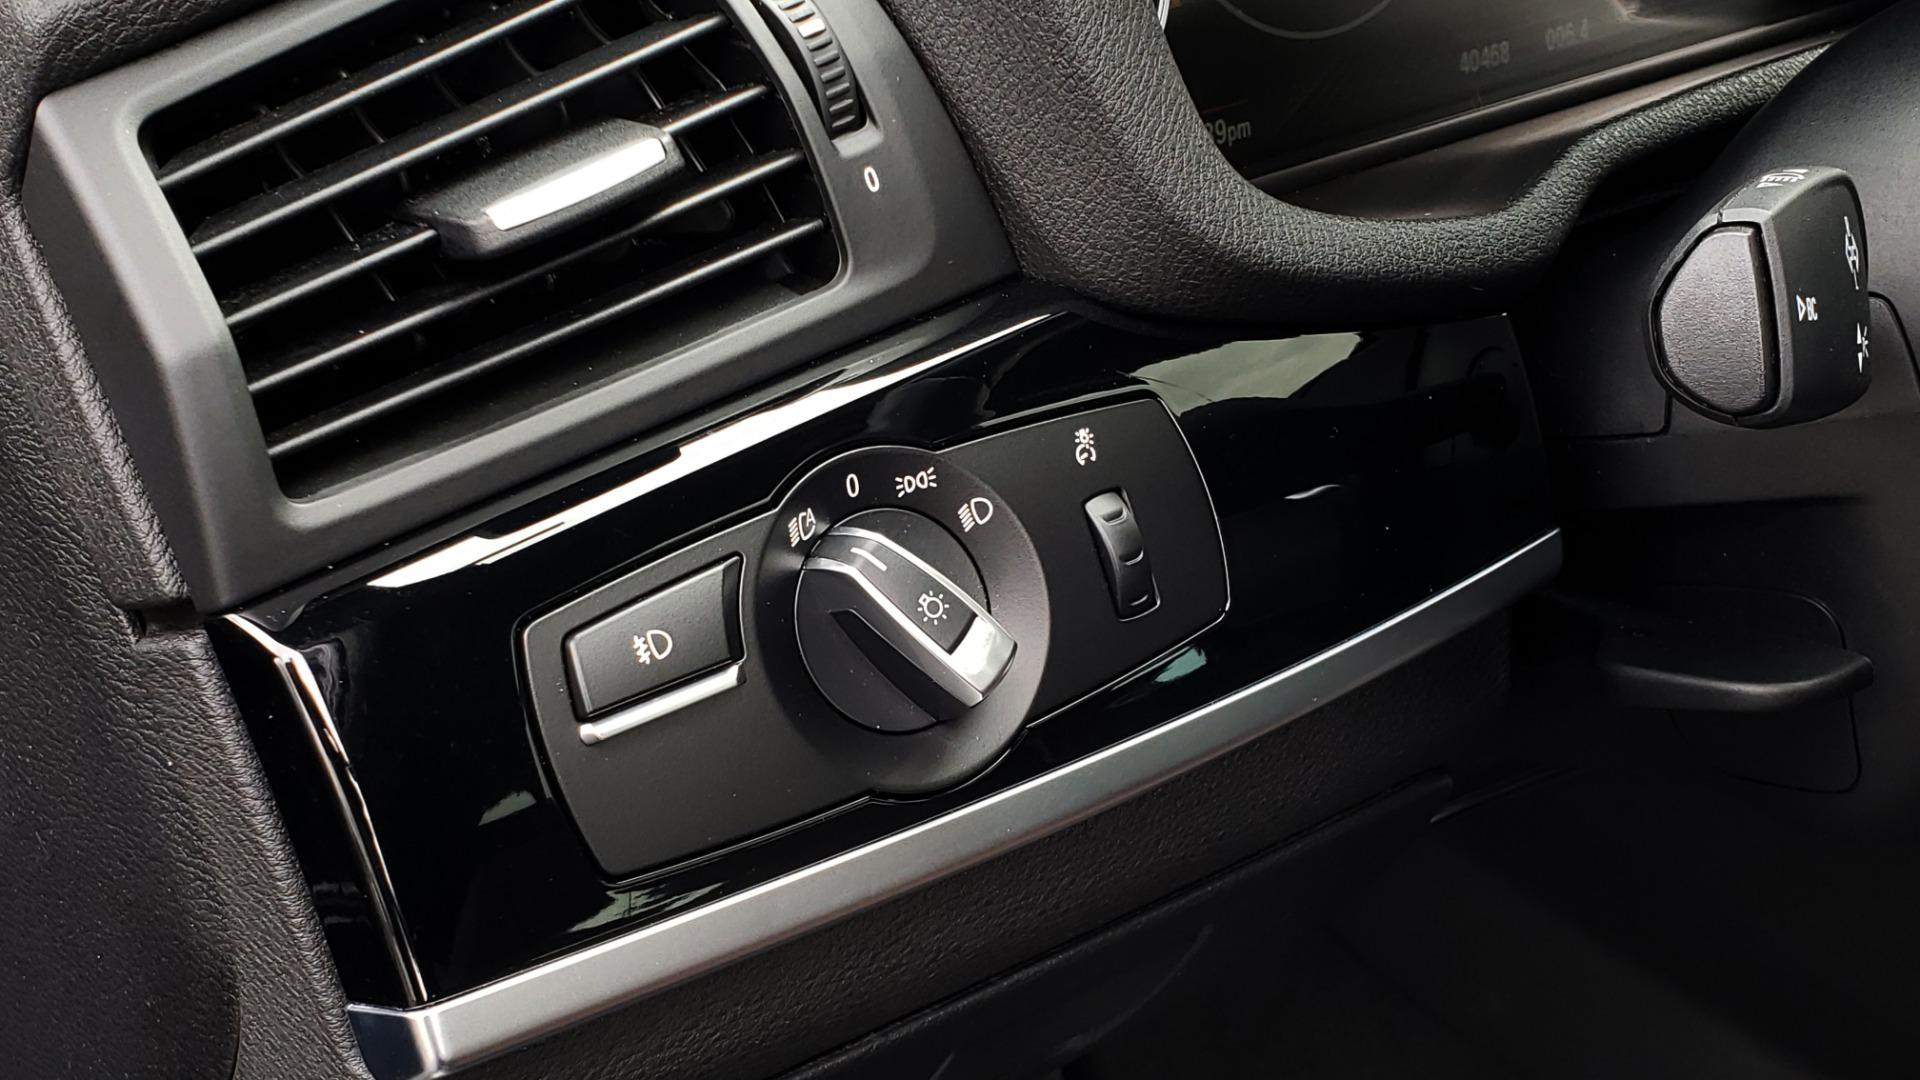 Used 2017 BMW X3 XDRIVE35I M-SPORT / DRVR ASST PLUS / TECHNOLOGY / HUD / BLIND SPOT for sale Sold at Formula Imports in Charlotte NC 28227 37